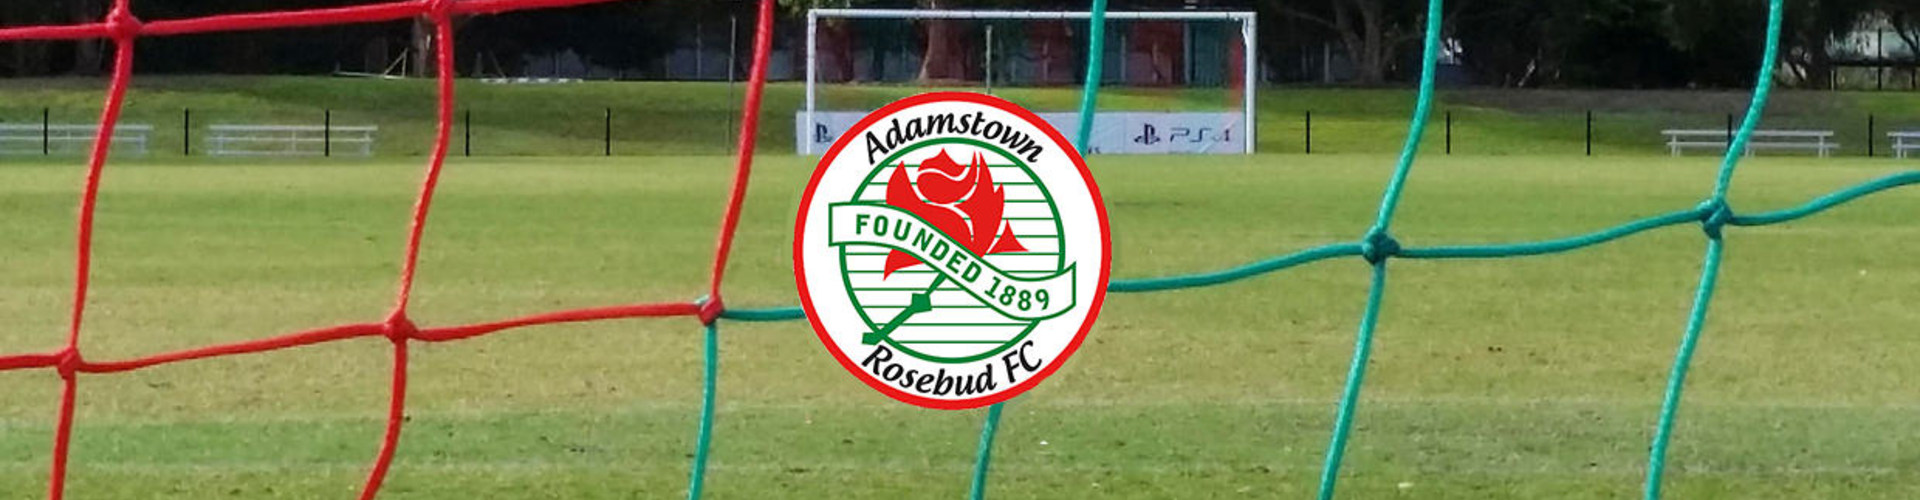 Adamstown goal 1240 x 600 with logo